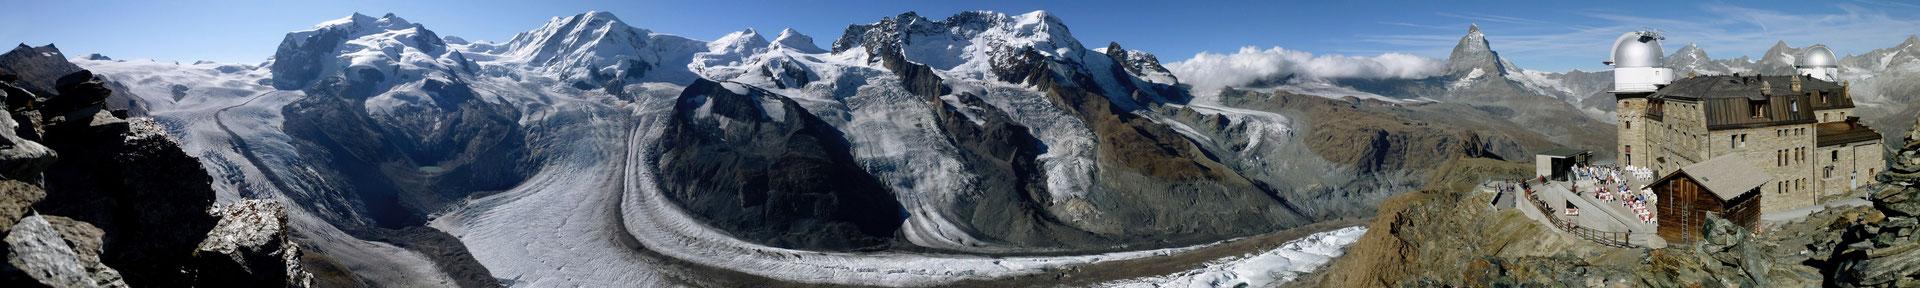 Panorama, Gornergrat, 3089m, Zermatt, Suisse, Ch,  1.jpg